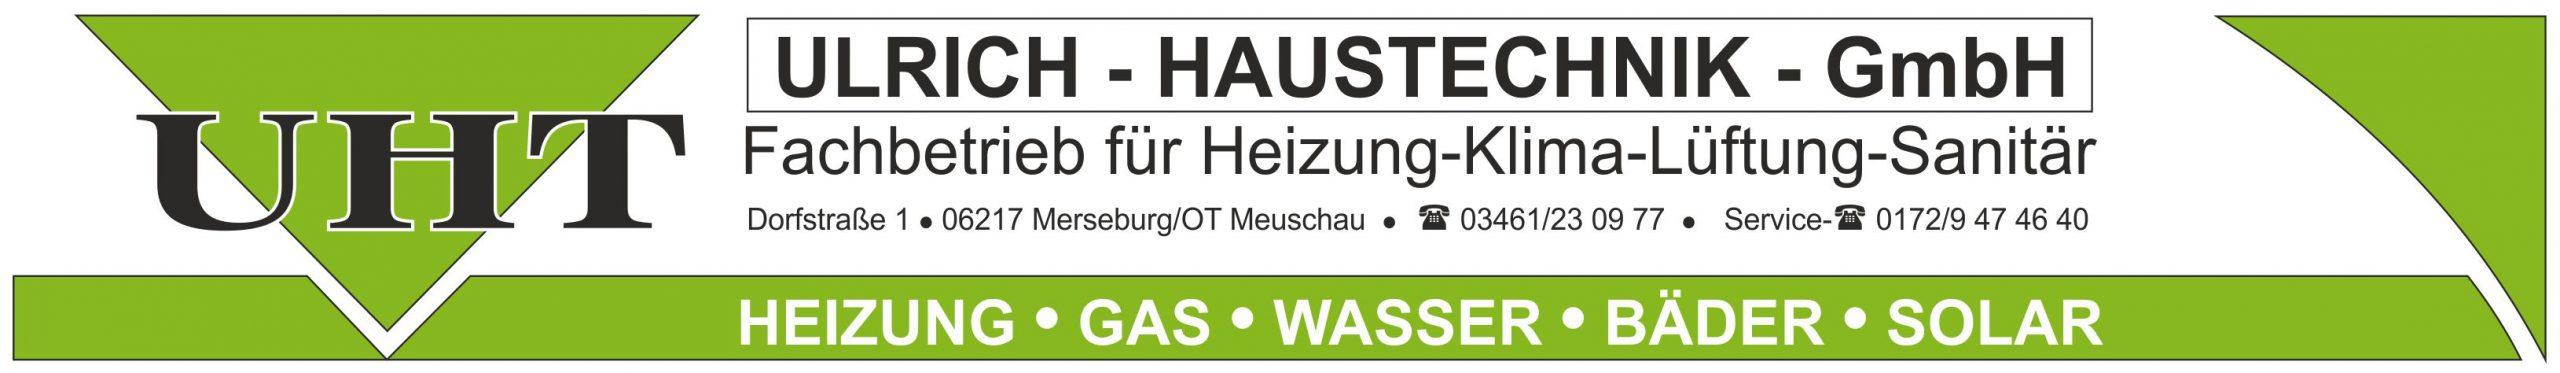 ULRICH - HAUSTECHNIK - GmbH